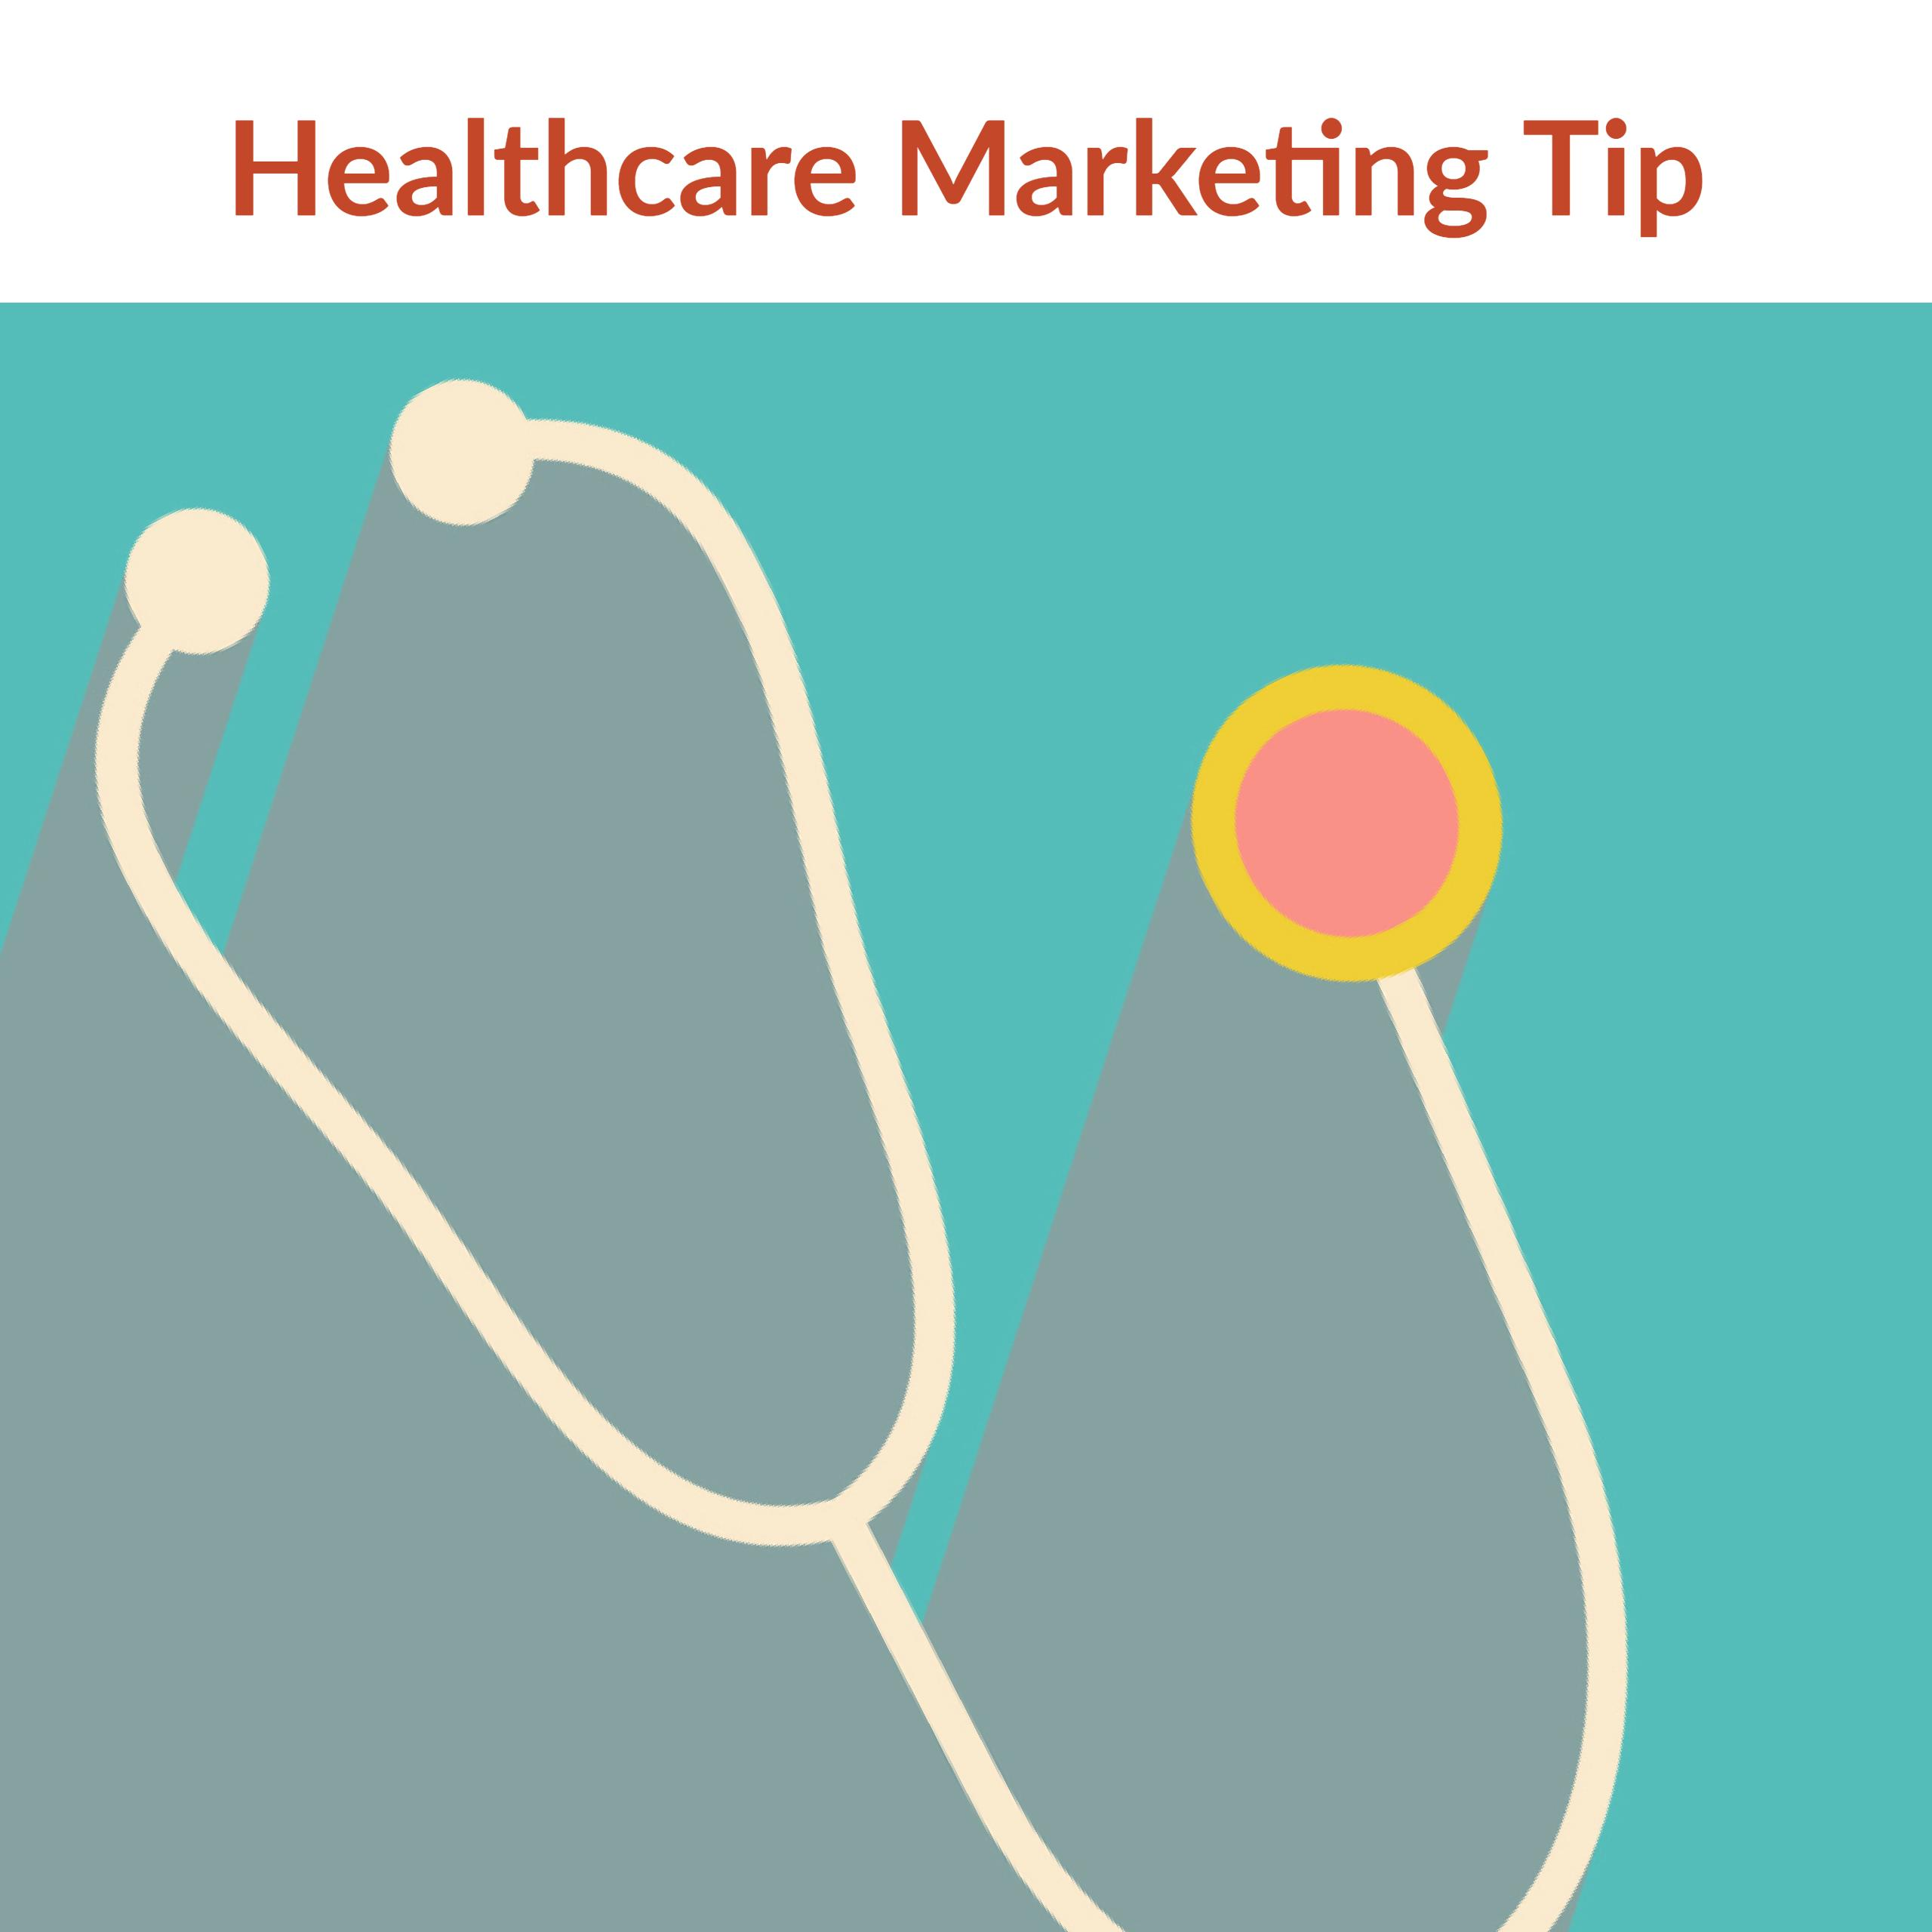 Specialty Healthcare Providers CAN Use Visual Social Media Marketing